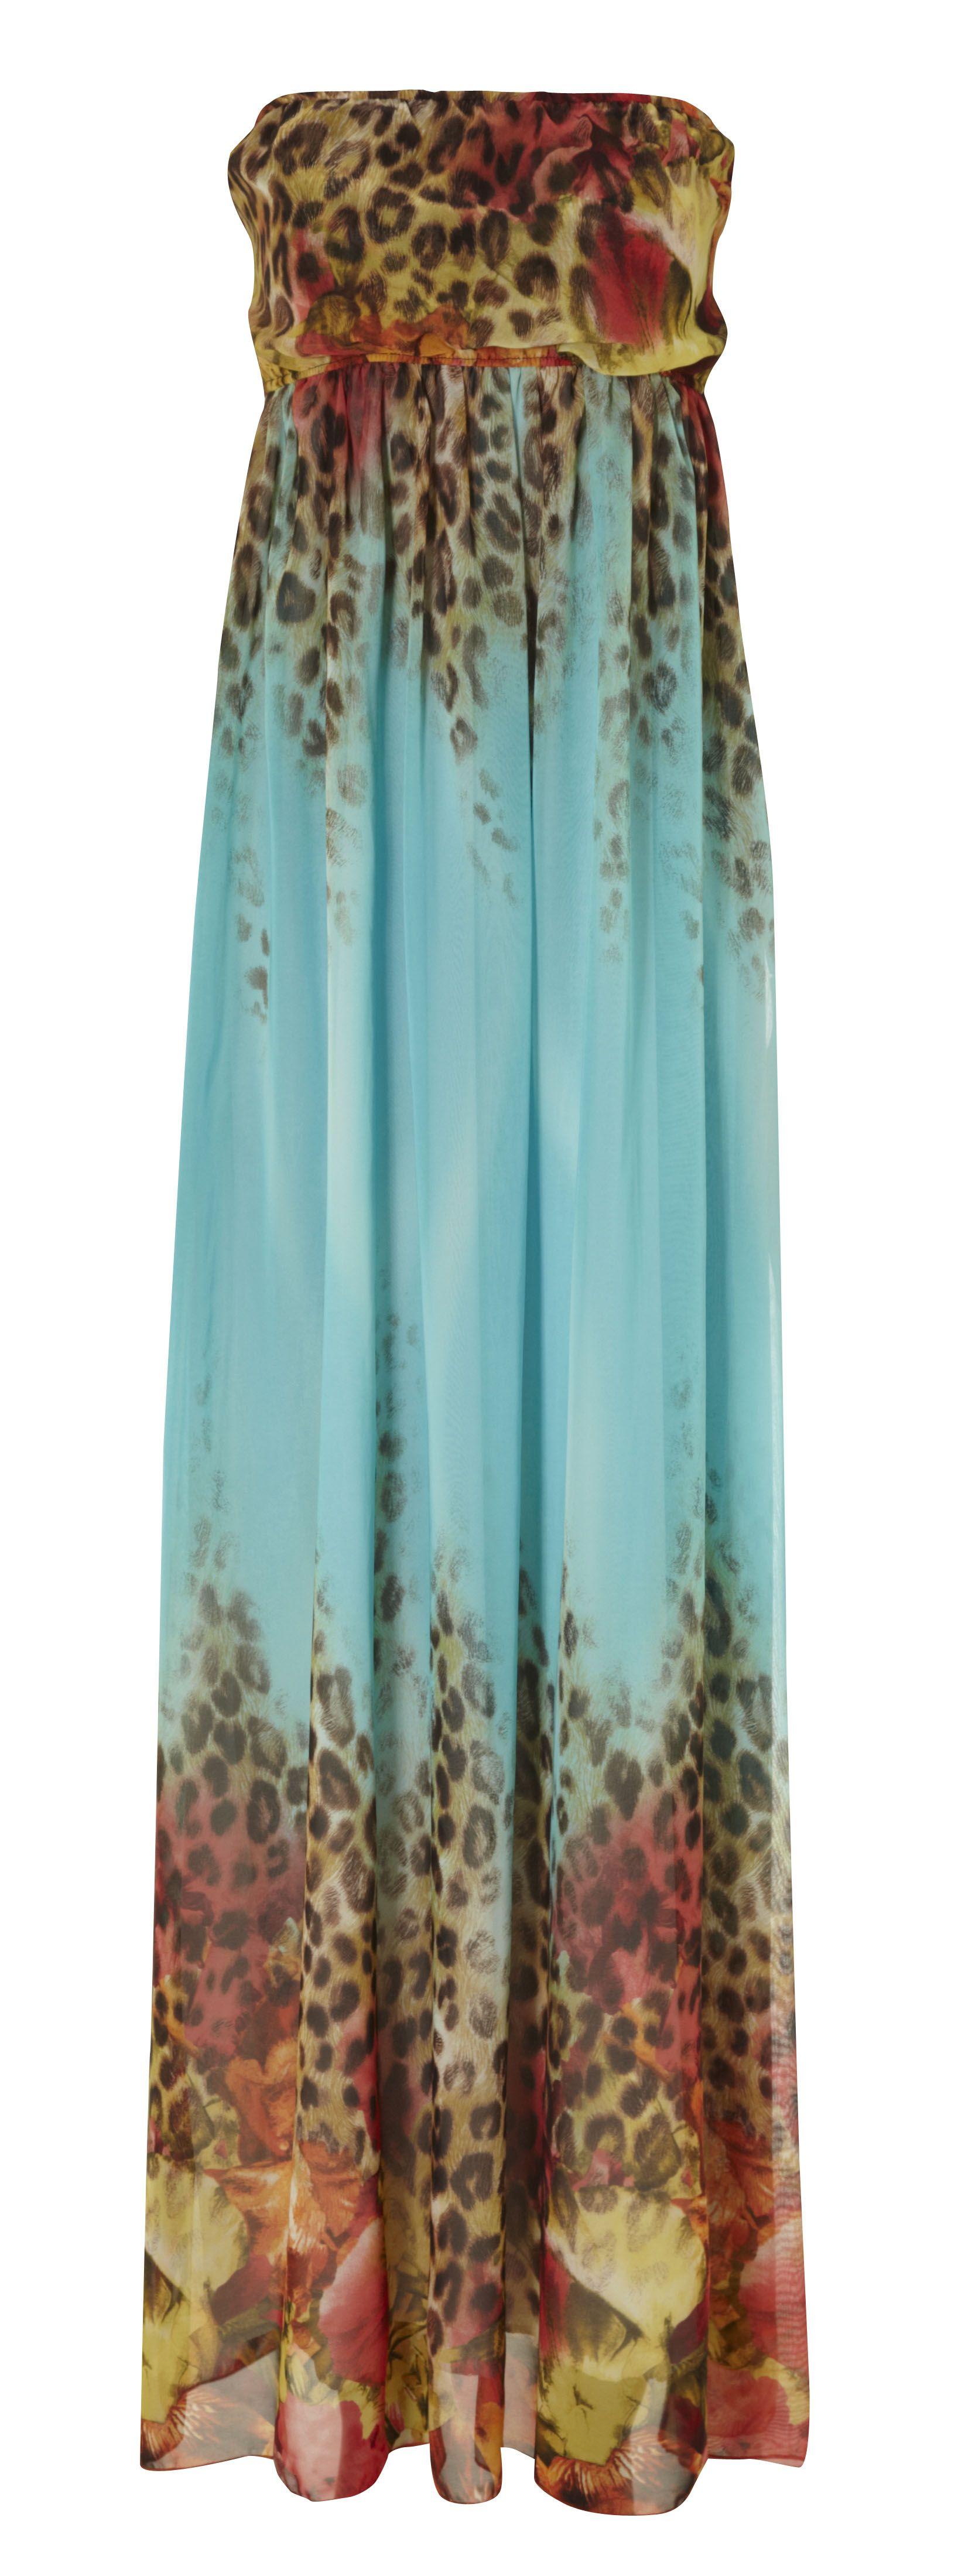 maxi dress | Maxi dress - Jane Norman - £60